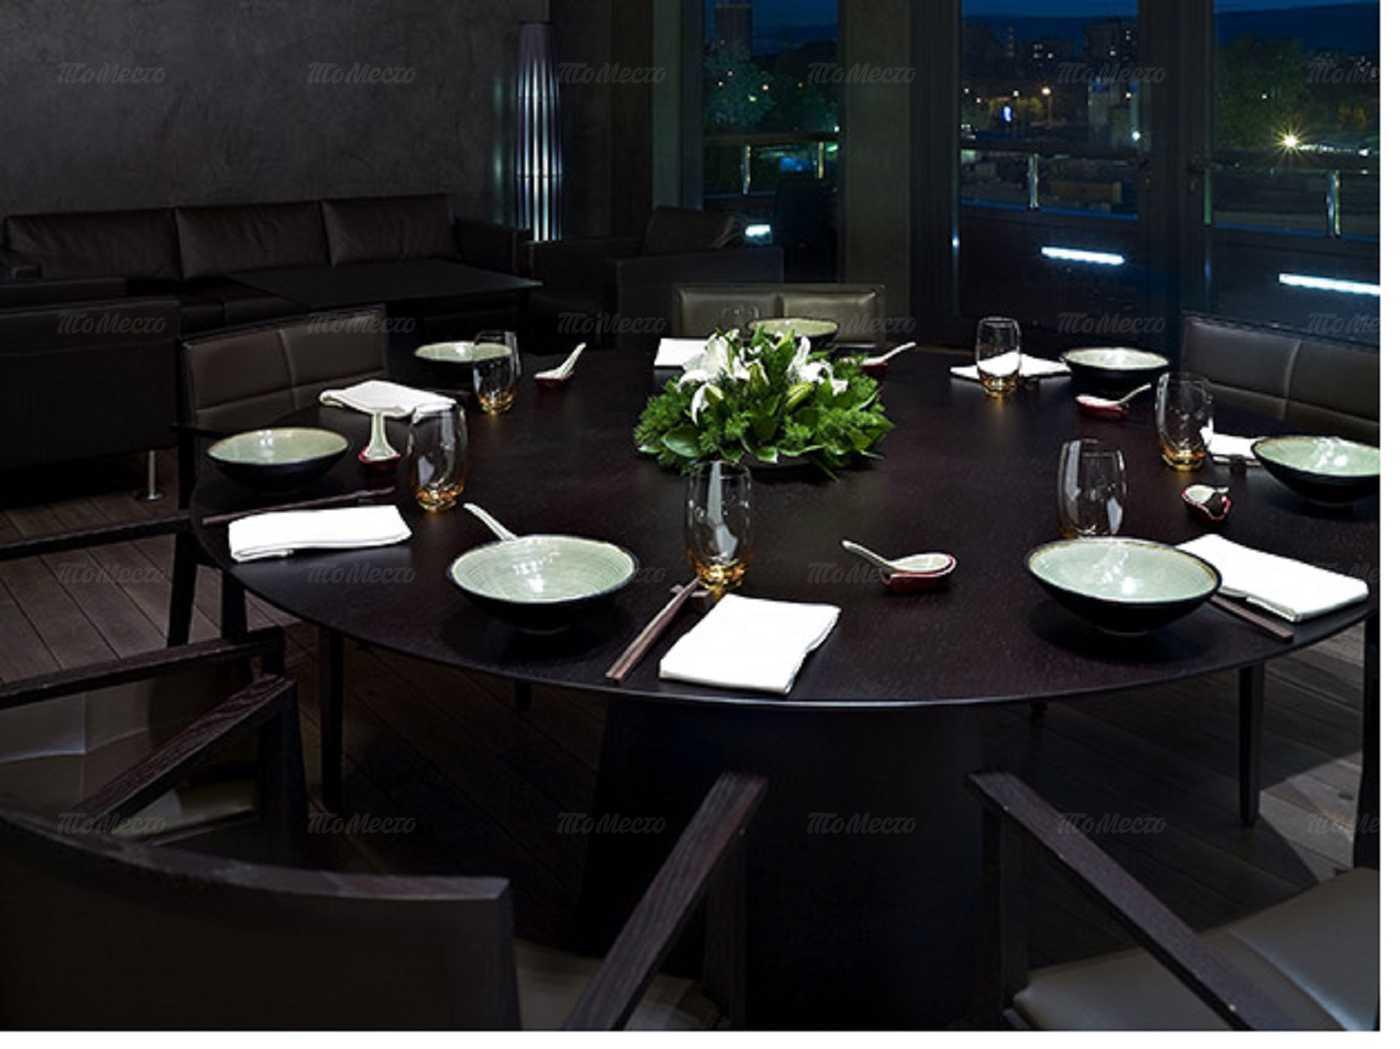 Меню ресторана Noble House (Нобл Хаус) в Борисе Ельциной